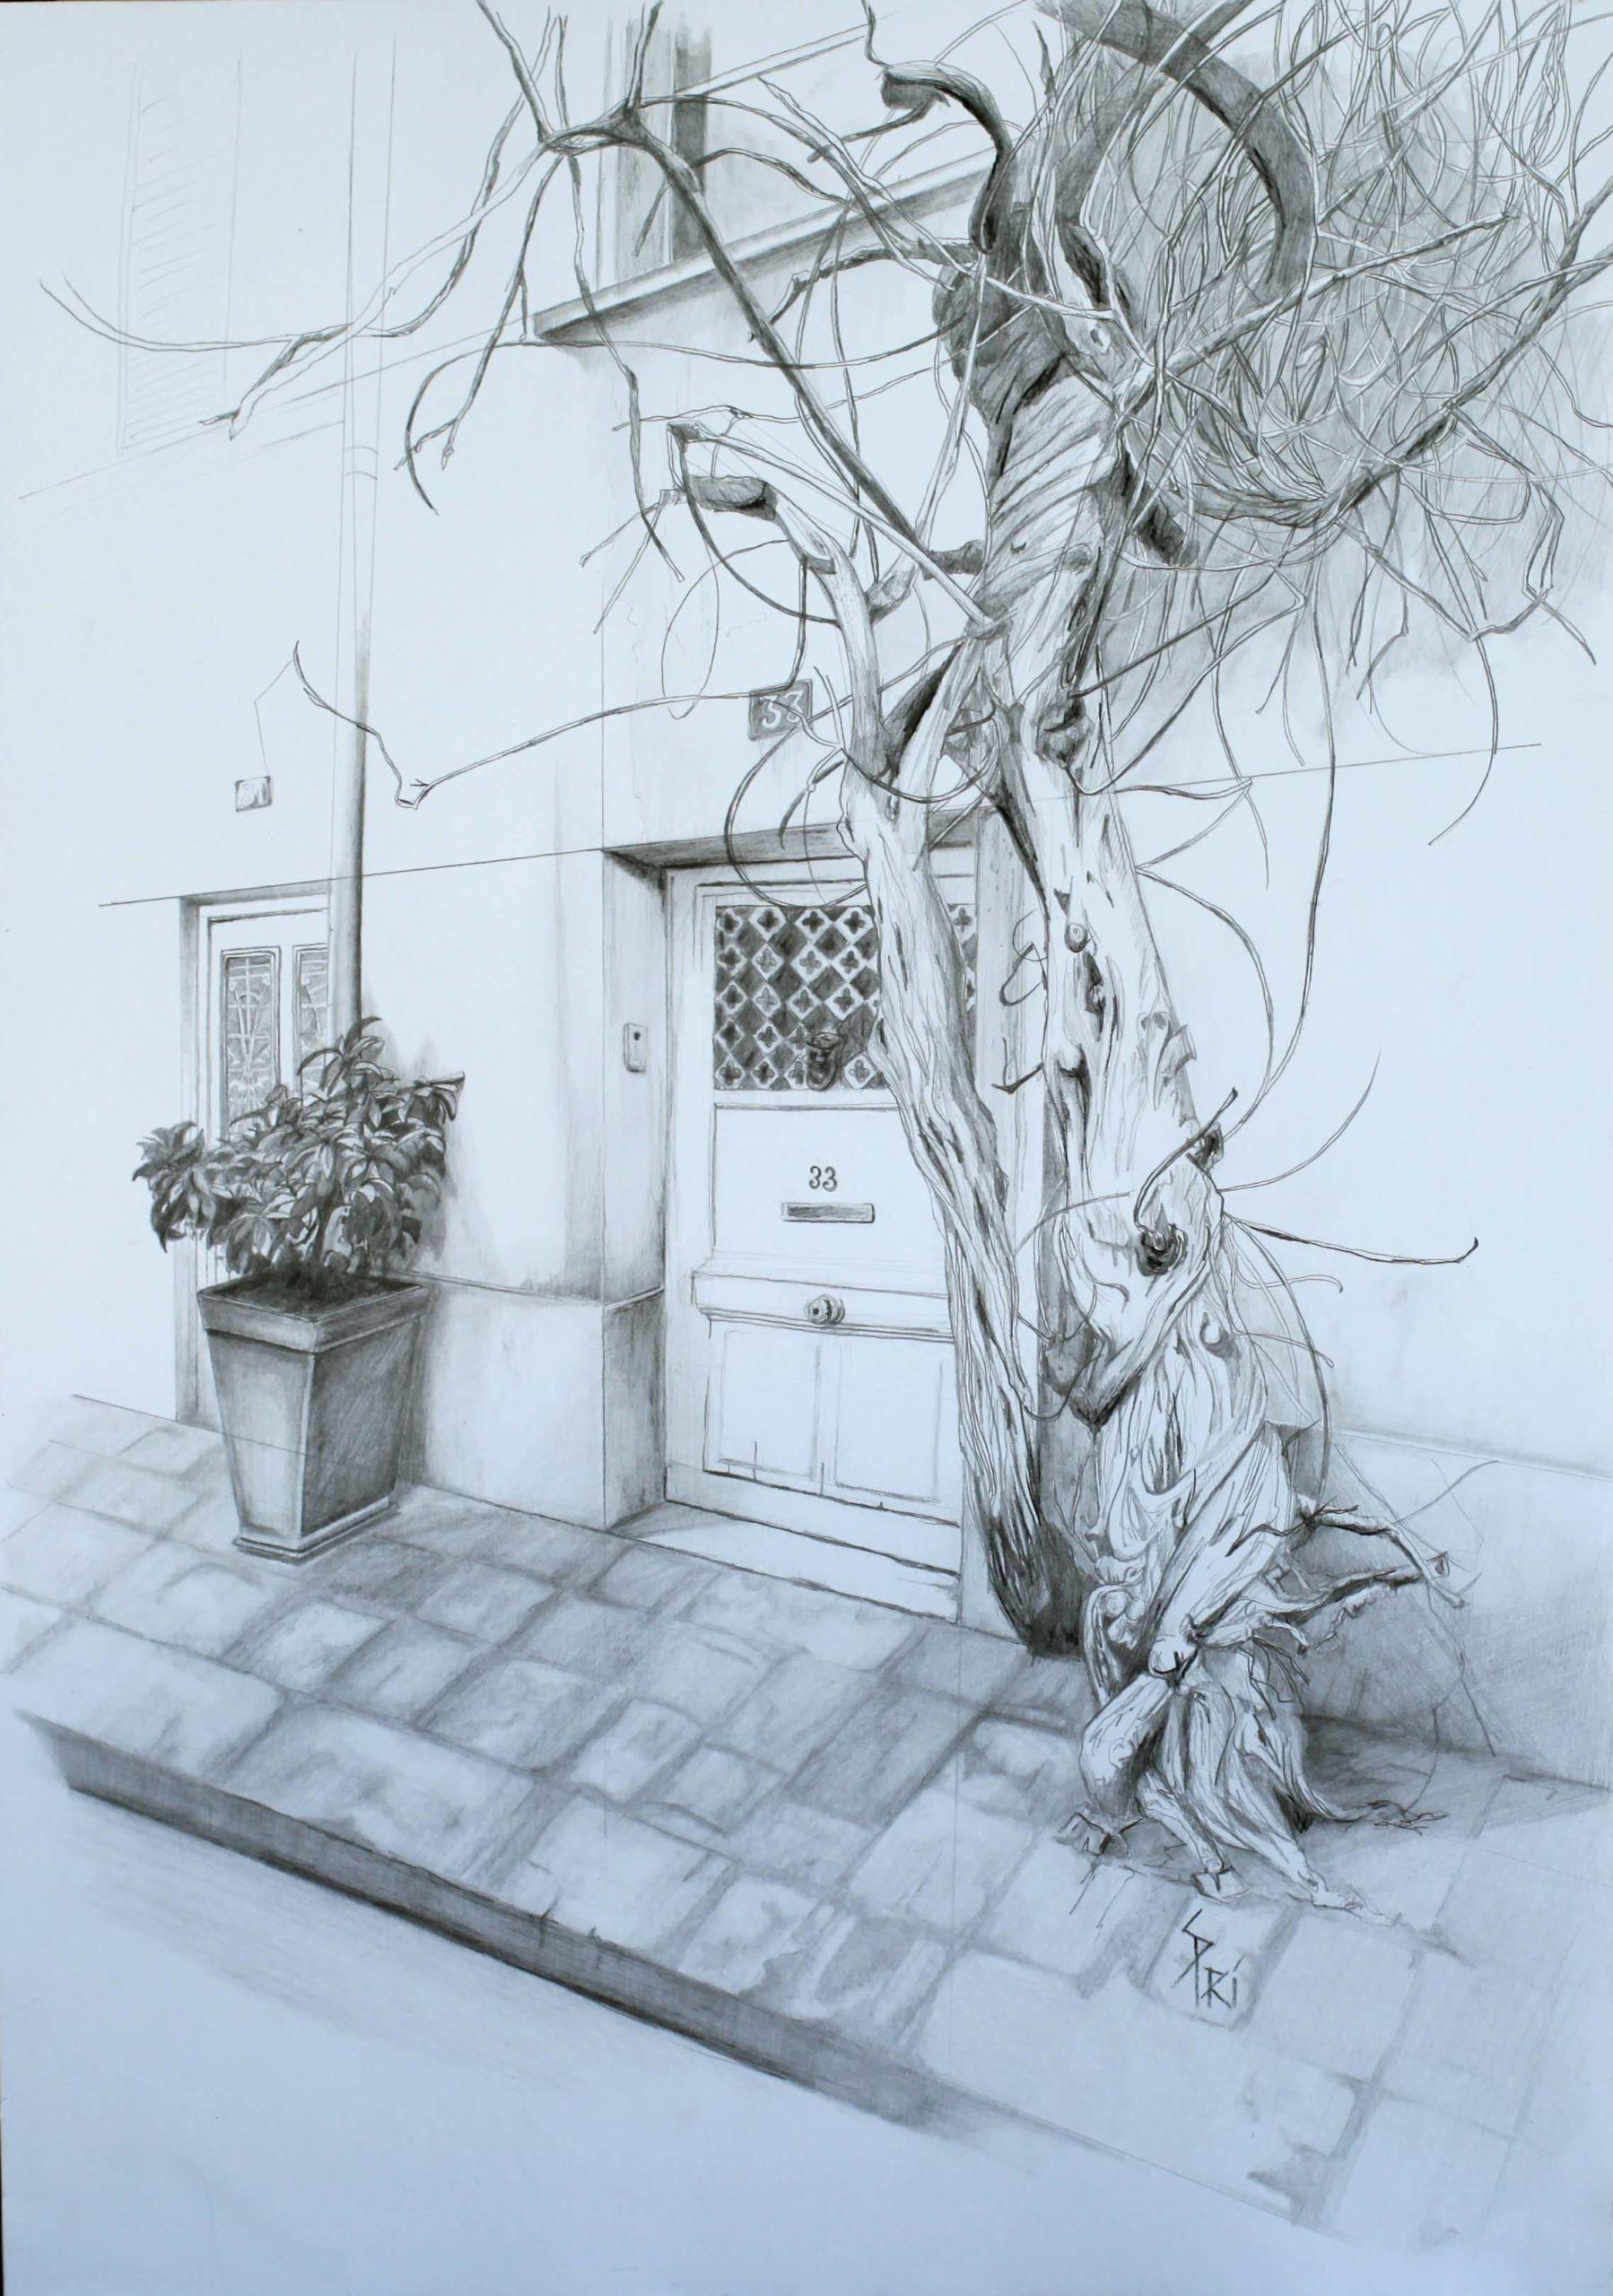 Dessin paysage par Priscilla Seiller